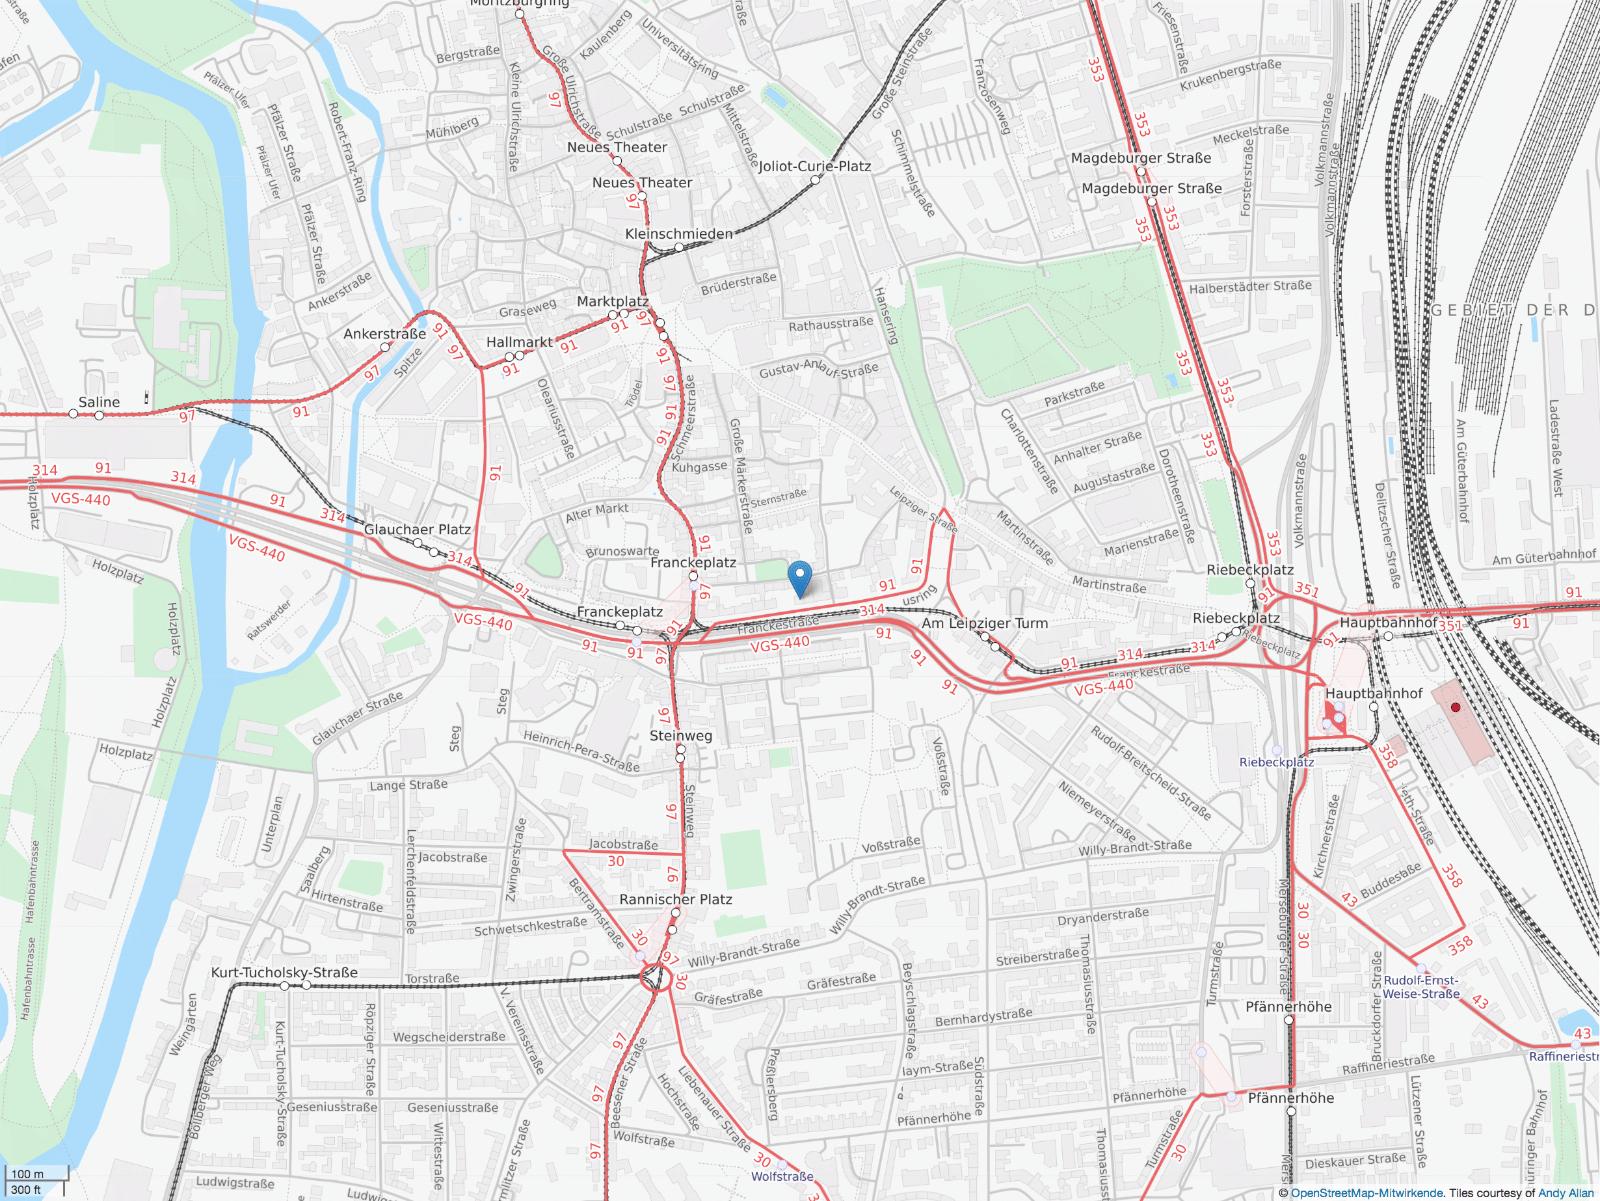 https://www.openstreetmap.org/?mlat=51.4792&mlon=11.9775#map=16/51.4792/11.9775&layers=T